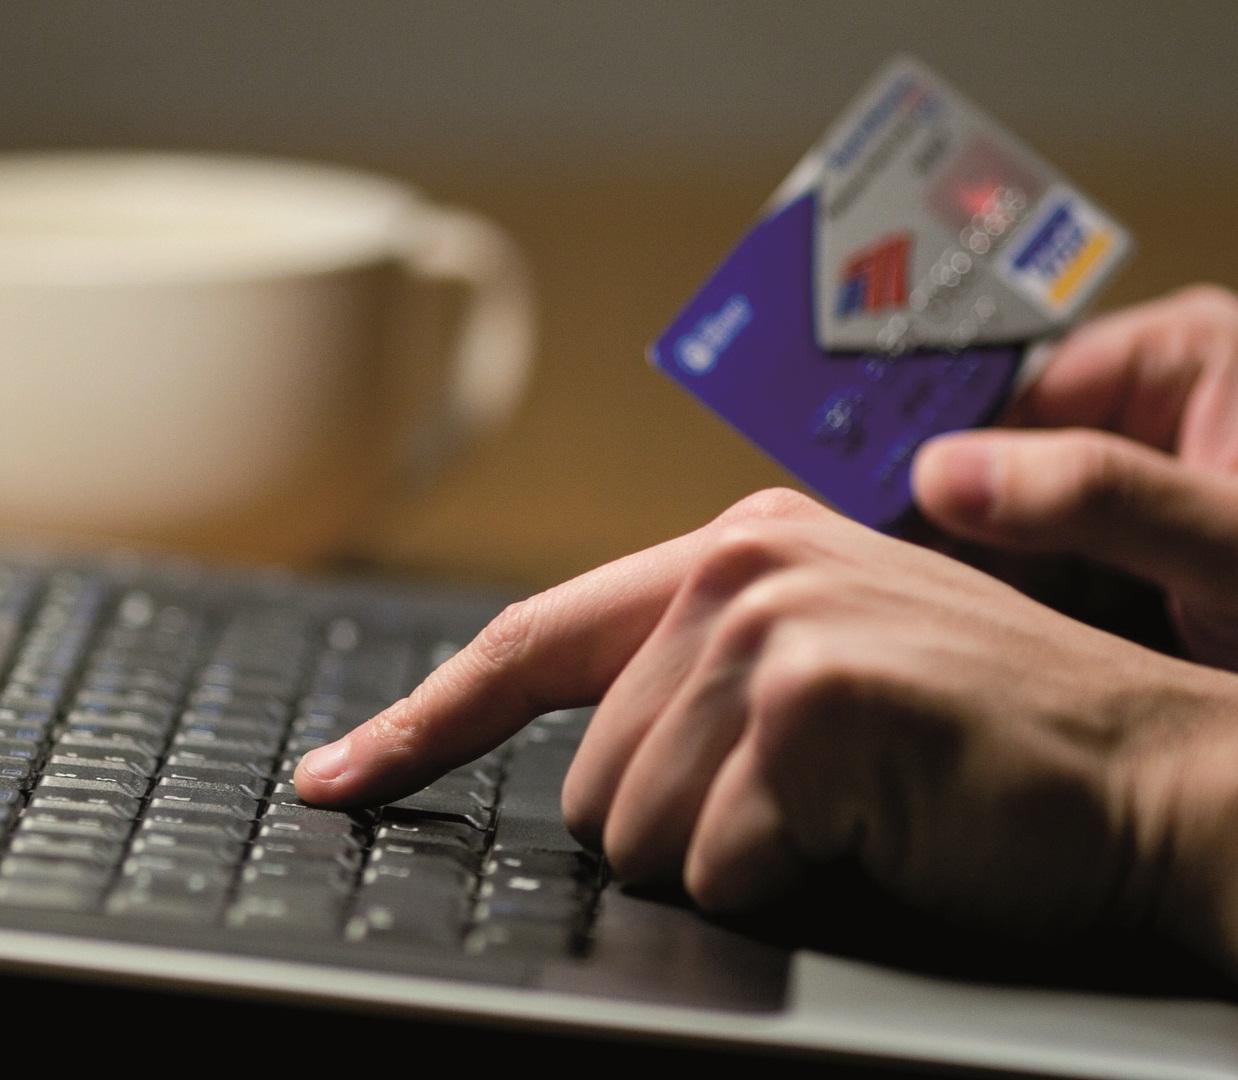 Сайт в интернете мошенники